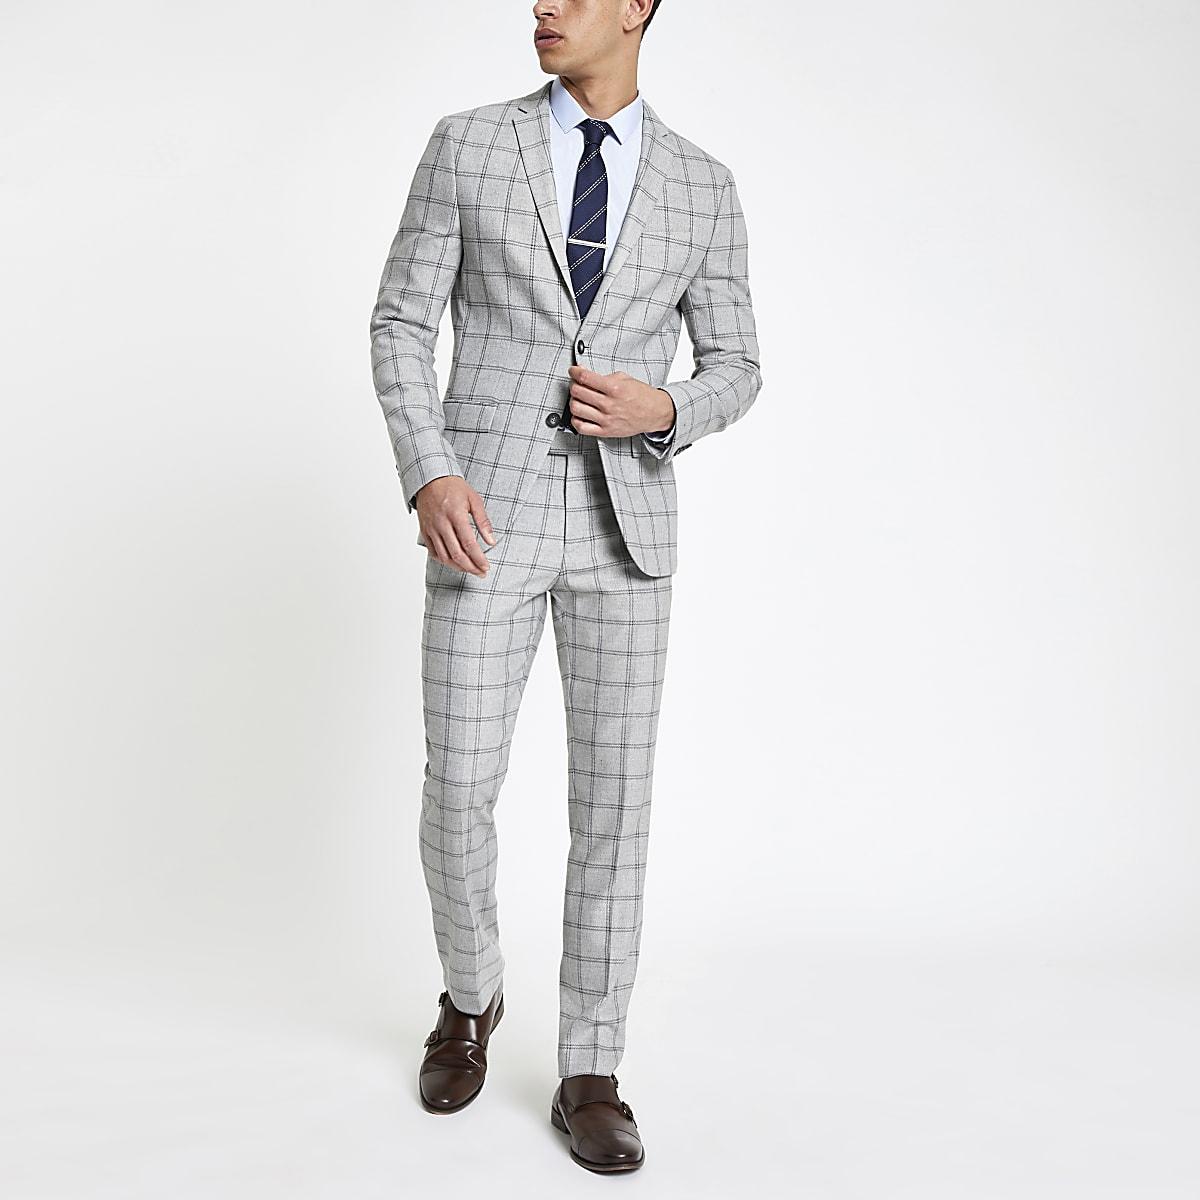 77f59f3360e6 Grey check stretch skinny fit suit jacket - Suit Jackets - Suits - men